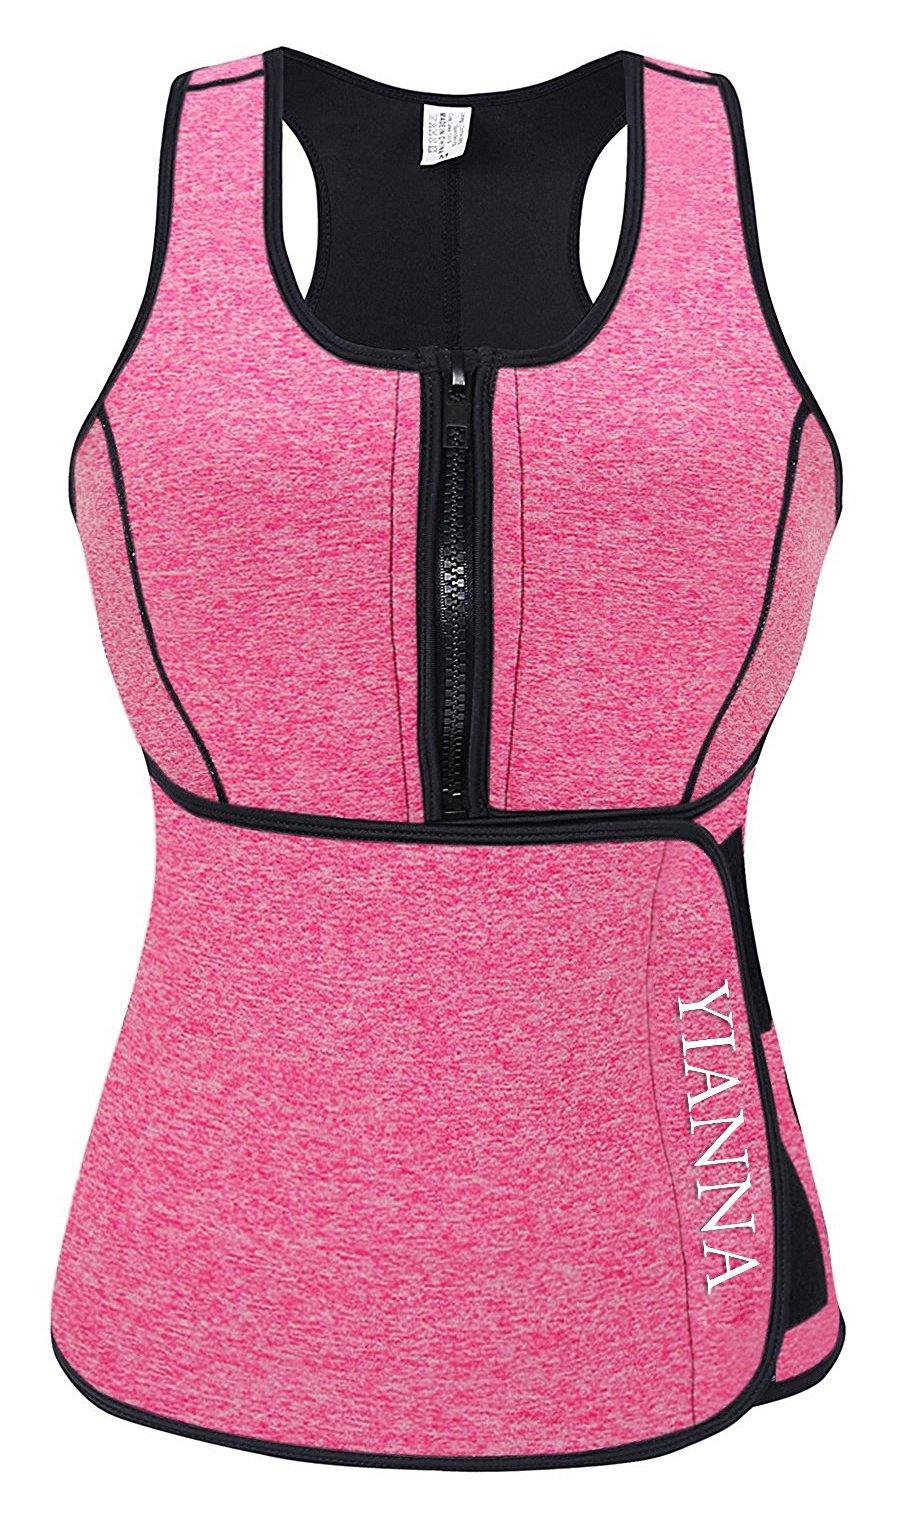 YIANNA Sweat Neoprene Sauna Suit - Waist Training Vest - Sauna Tank Top Vest with Adjustable Waist Trimmer/Shaper Trainer Belt for Weight Loss Plus Size up to 5XL, YA8012-New-Pink-XS